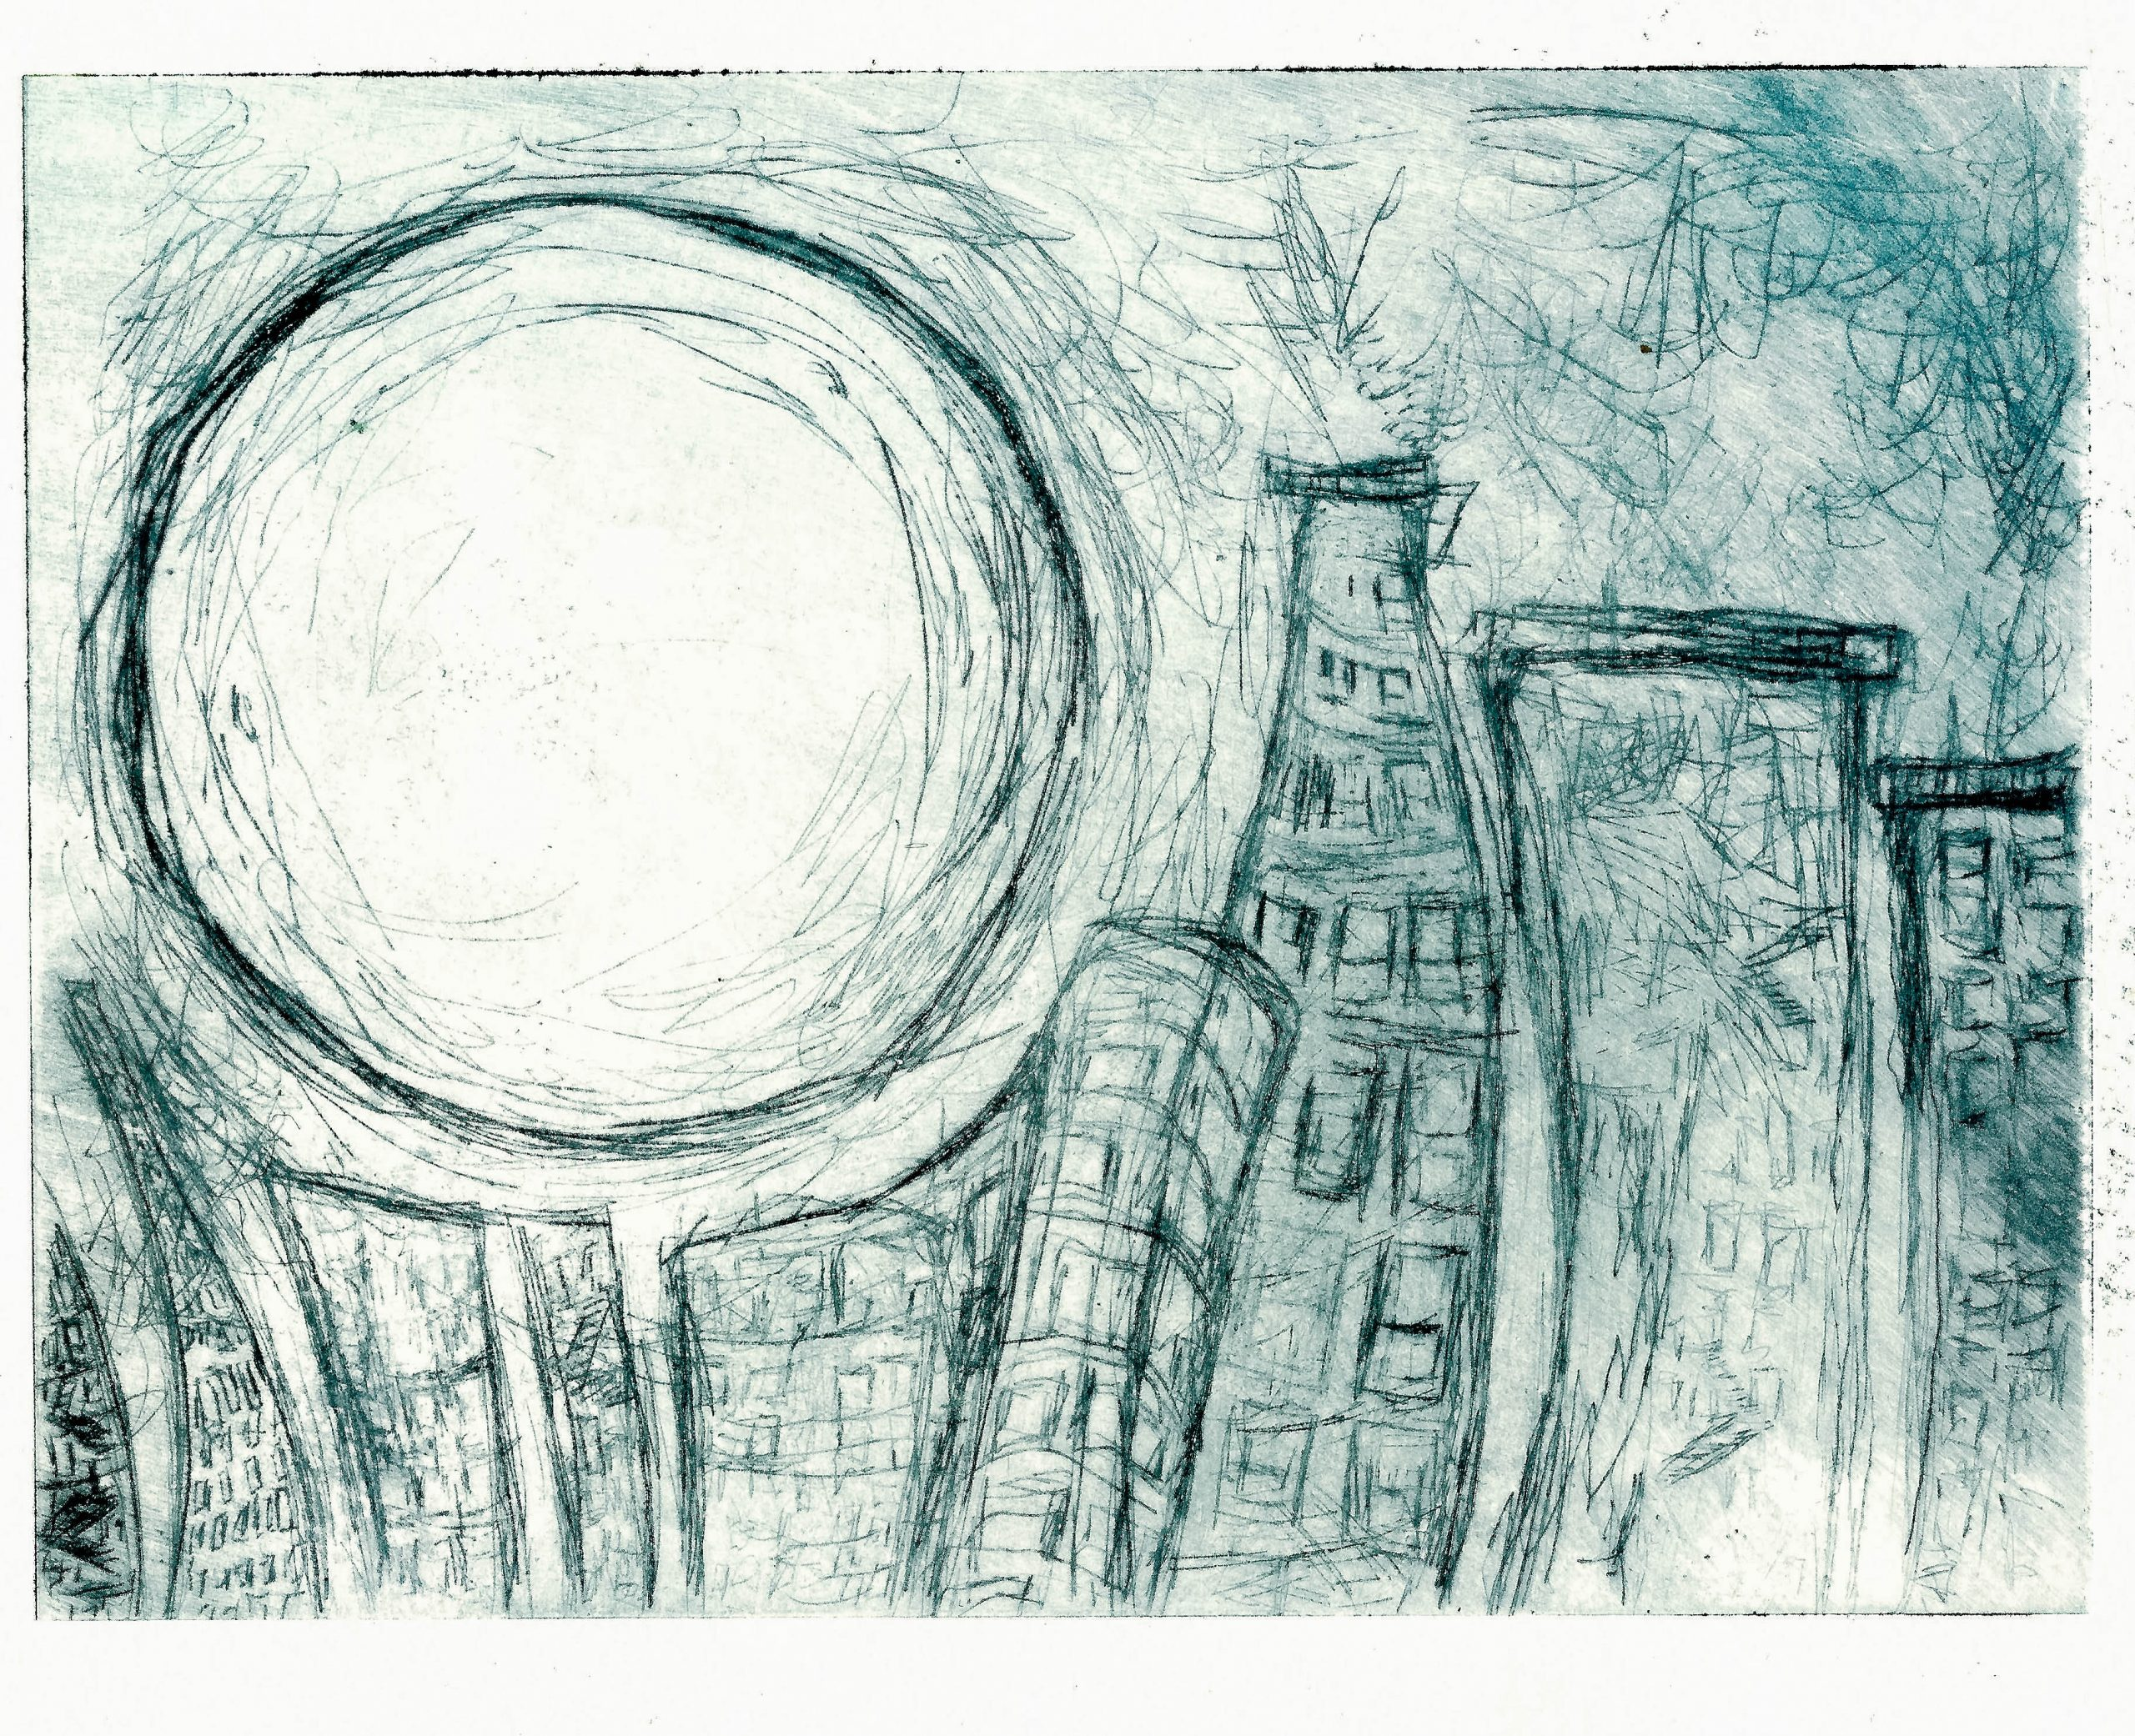 Regina VIqueira, City moon, 2013, intaglio print